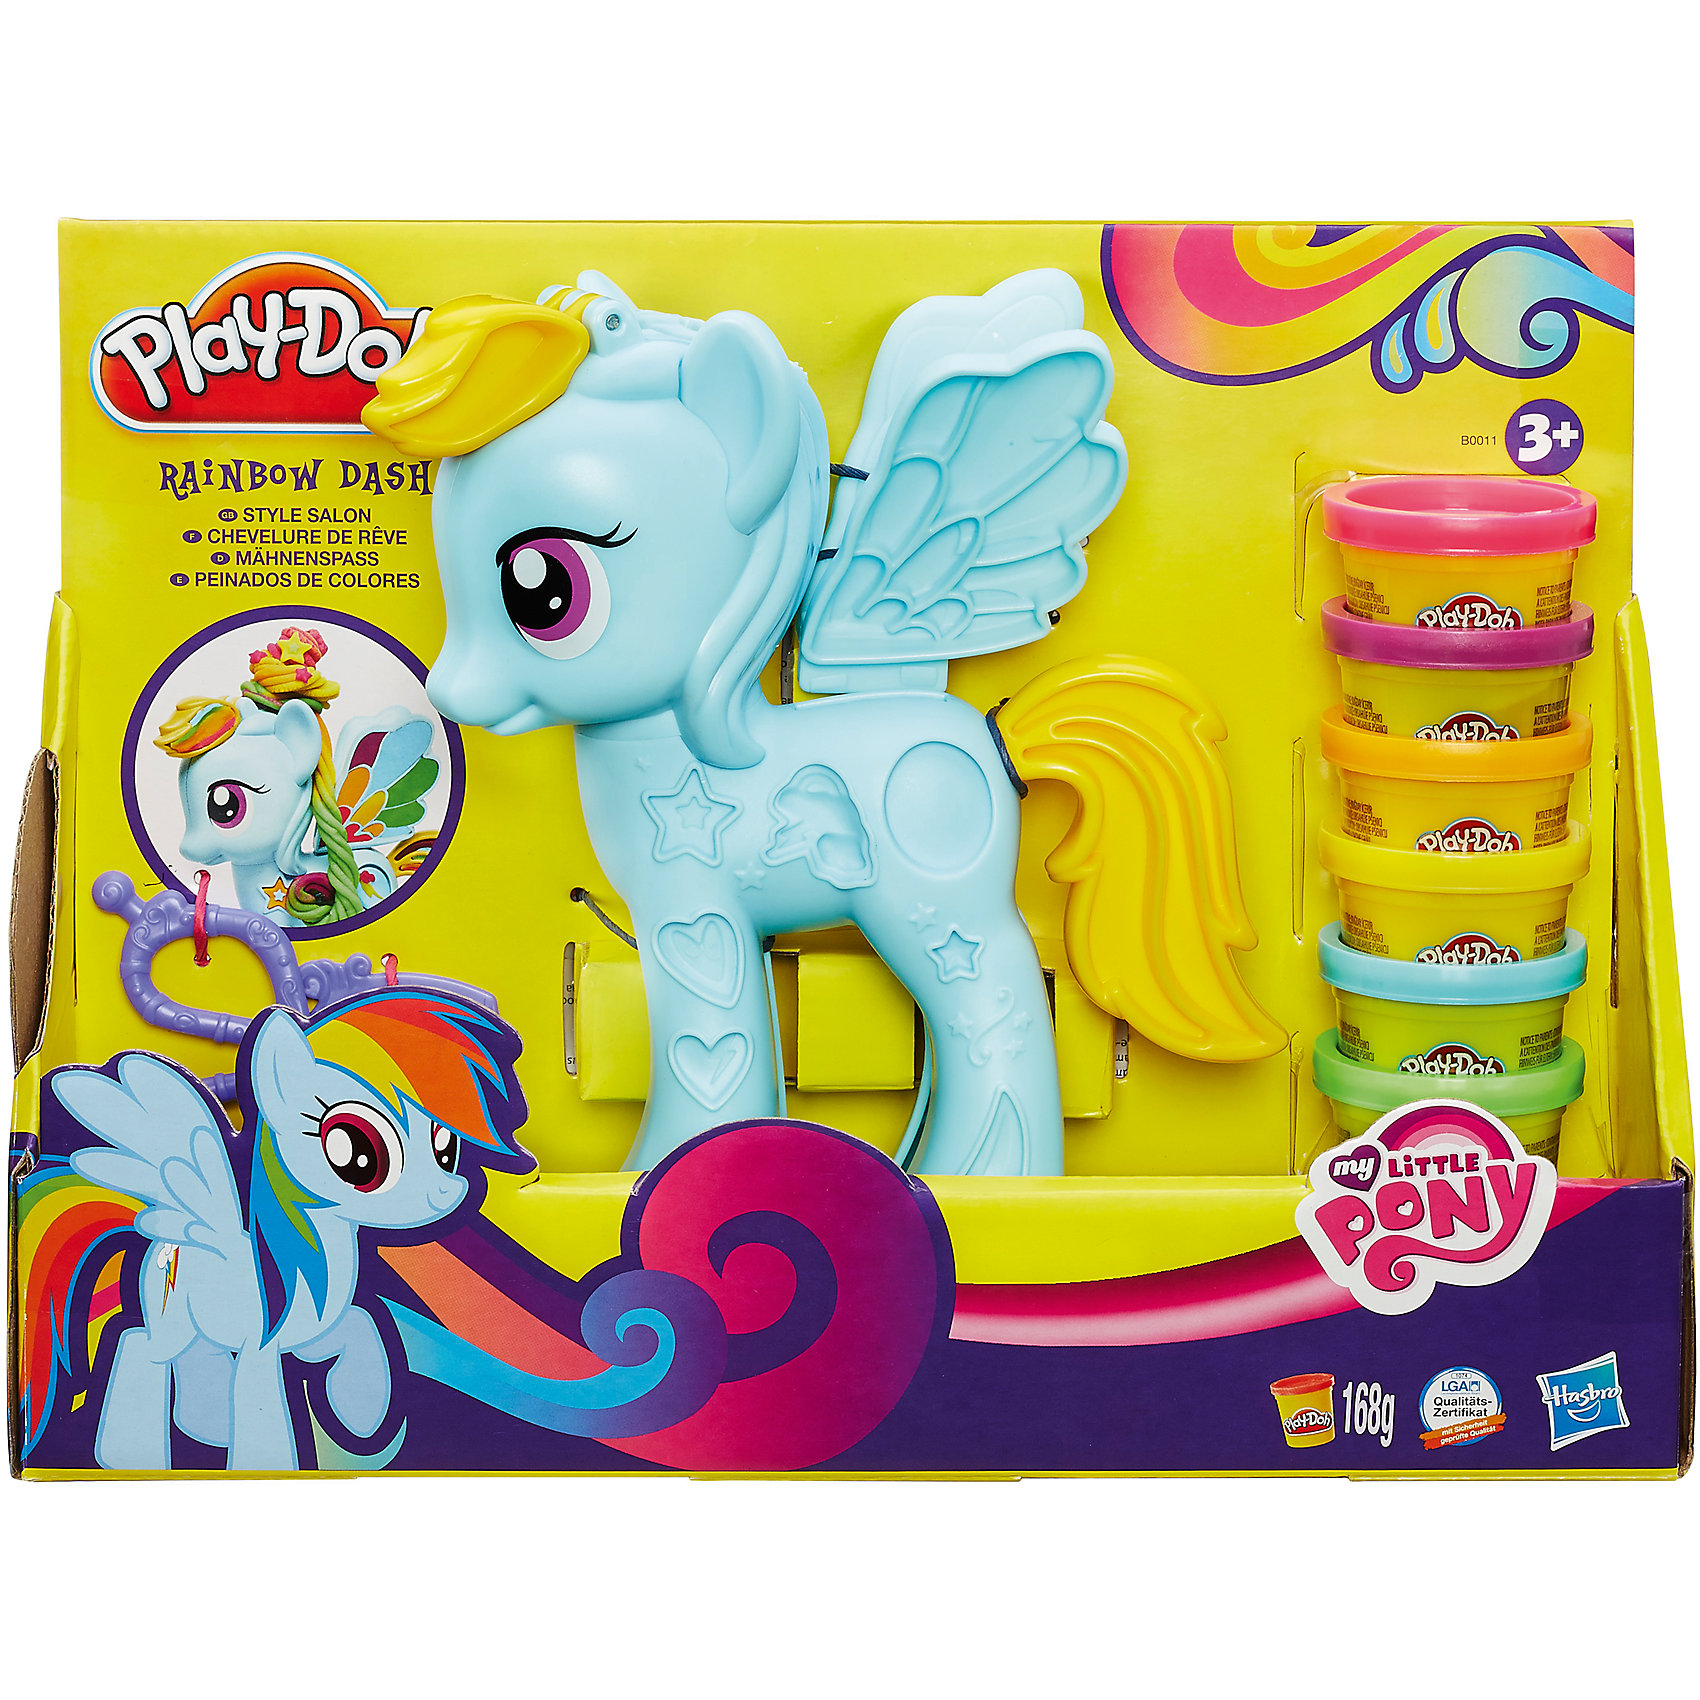 Hasbro Игровой набор Стильный салон Рэйнбоу Дэш, My little Pony, Play-Doh hasbro hasbro my little pony игровой набор поезд дружбы